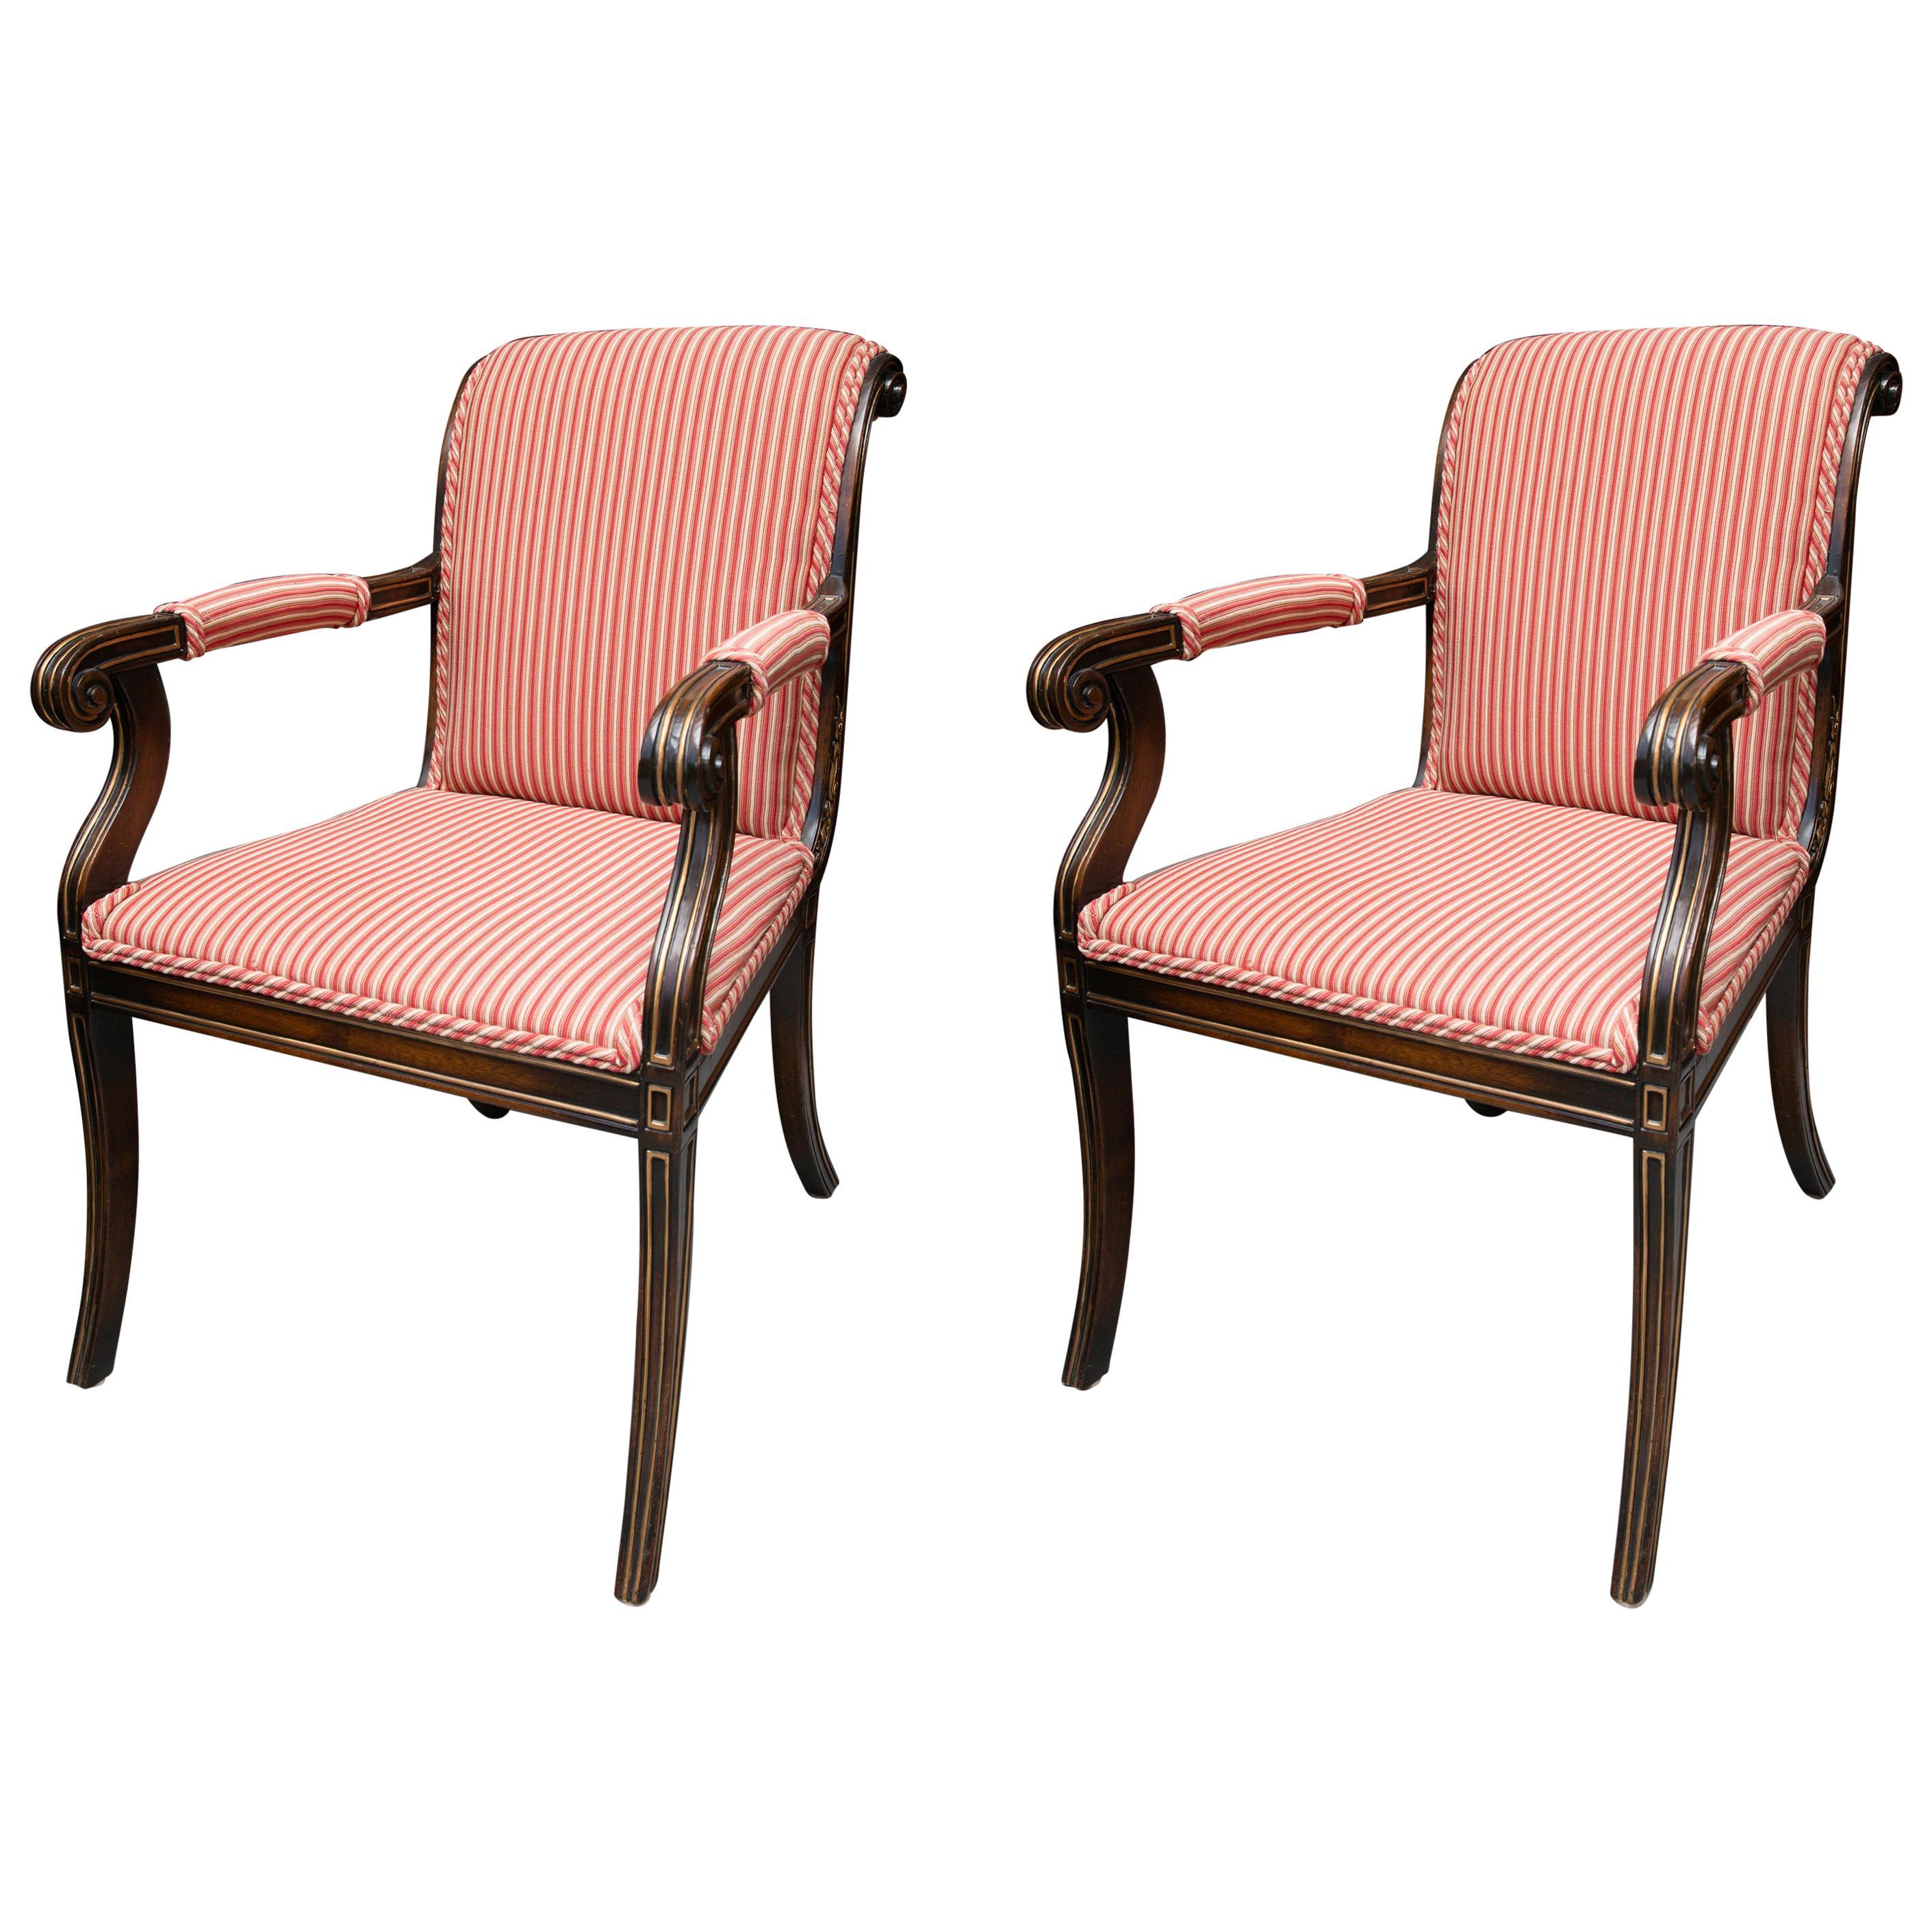 Pair of English Regency Style Mahogany and Parcel Gilt Klismos Armchairs